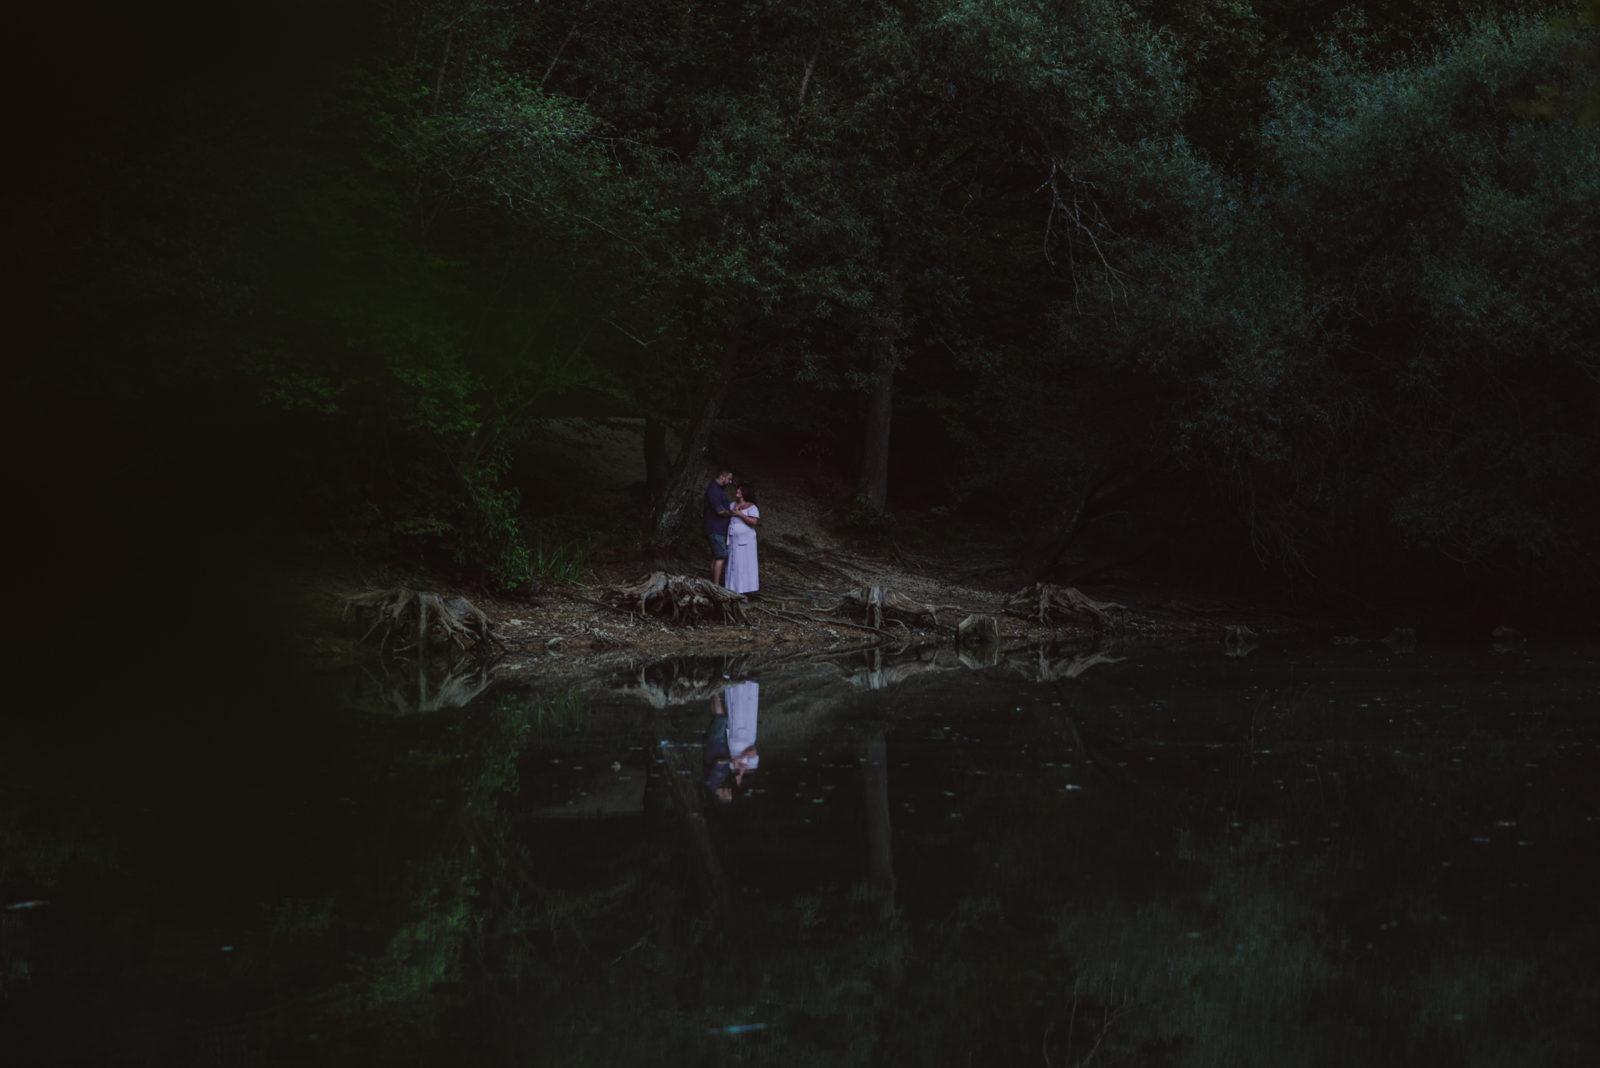 kerstin maier photography - babybauch paarshoot outdoors - sina + patrick